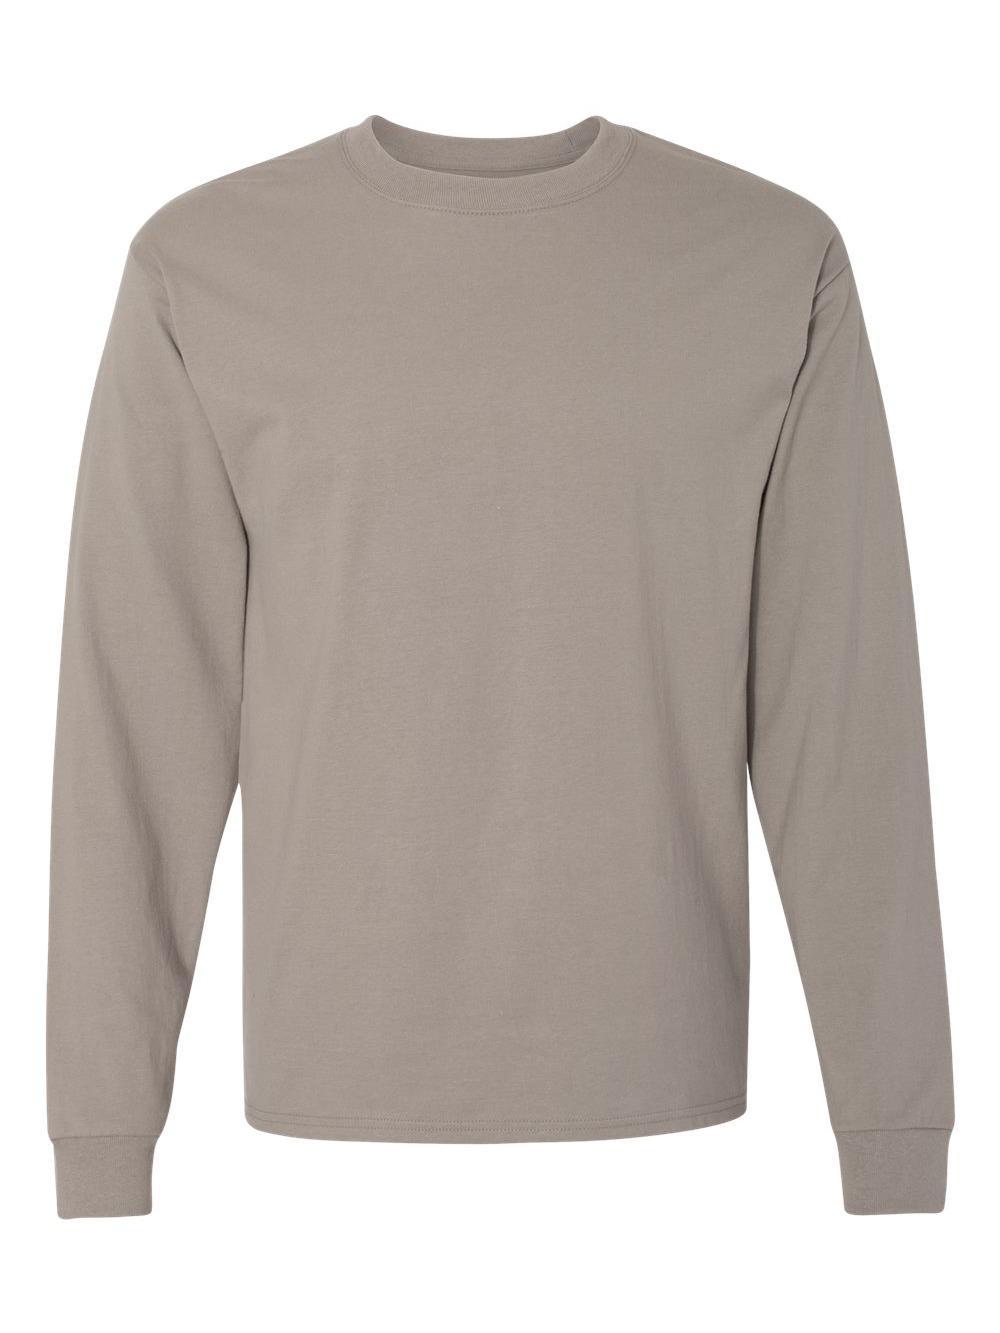 Hanes-Beefy-T-Long-Sleeve-T-Shirt-5186 thumbnail 51